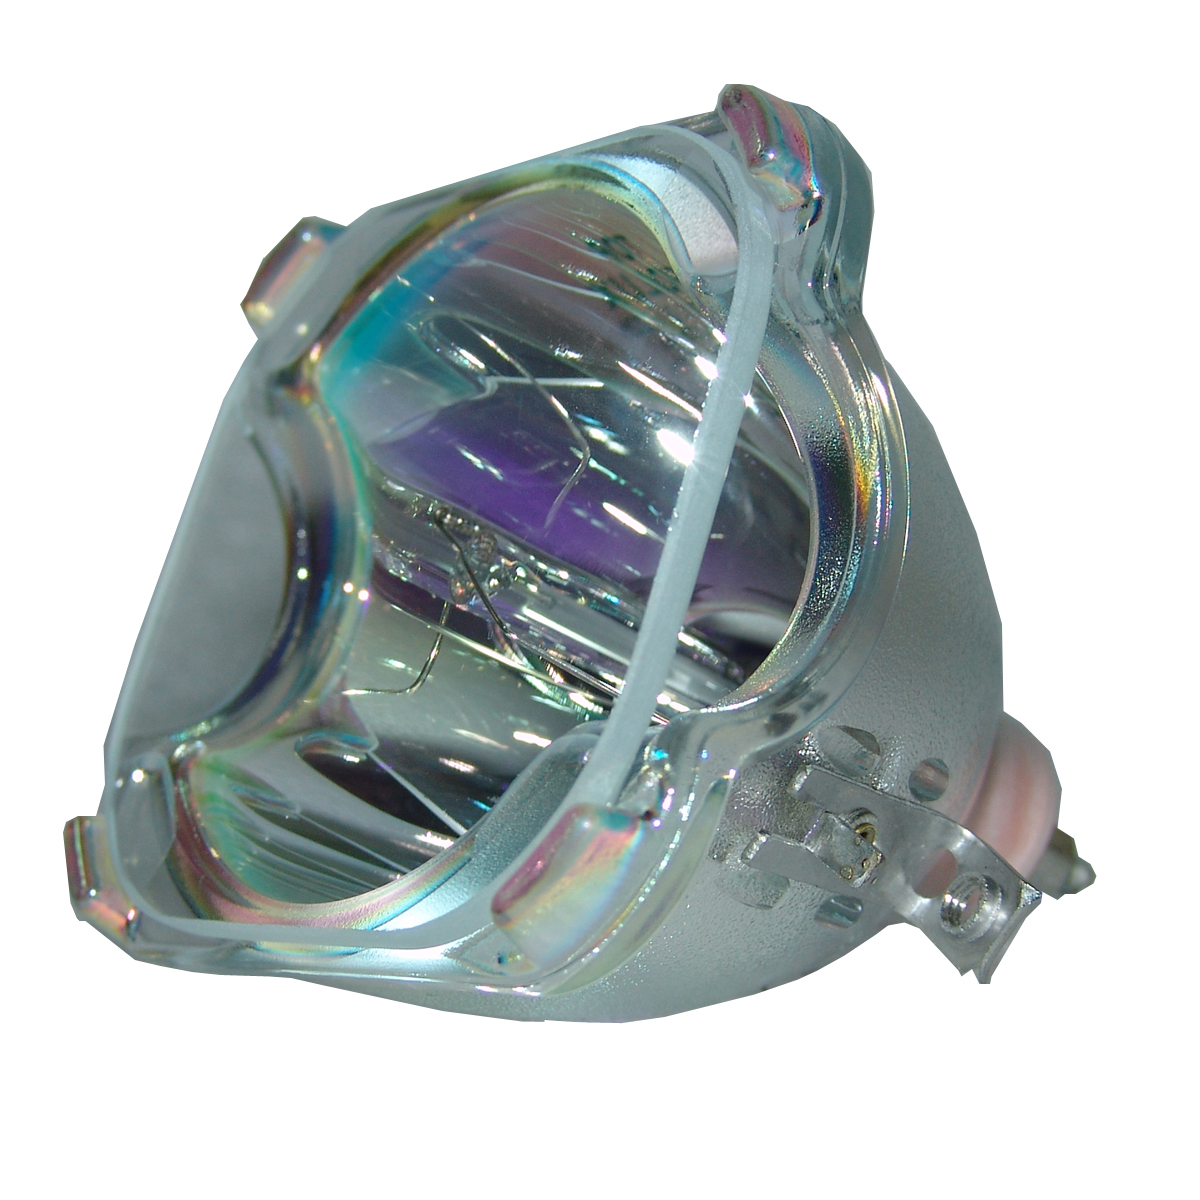 Osram Bare Lamp For EyeVis EC-80-XT / EC80XT Projection TV Bulb DLP